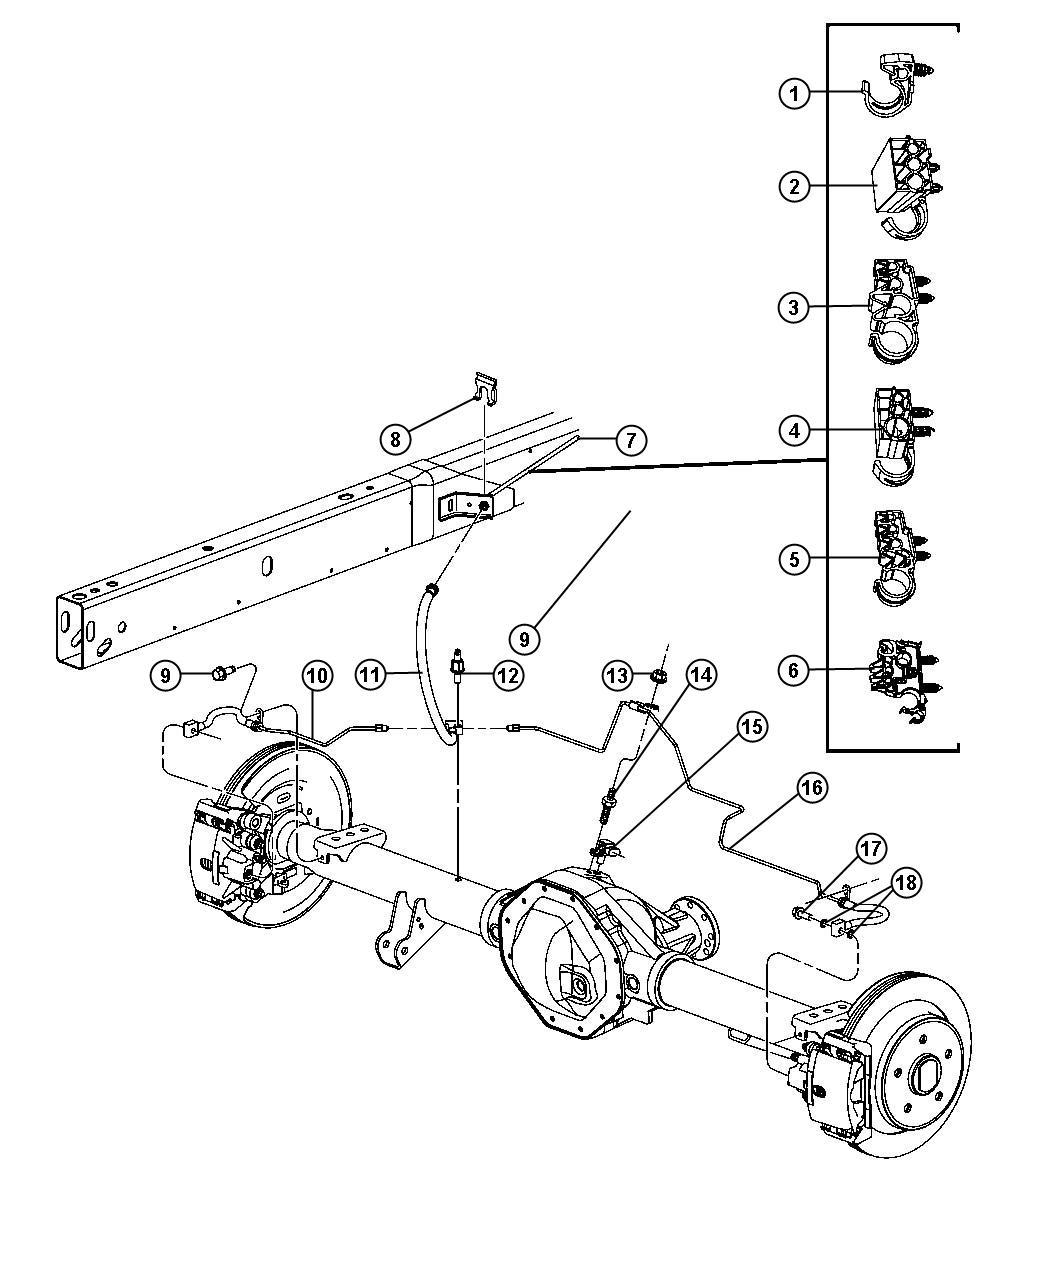 Dodge Ram 1500 Hose. Brake. Rear. [anti-lock 4-wheel disc